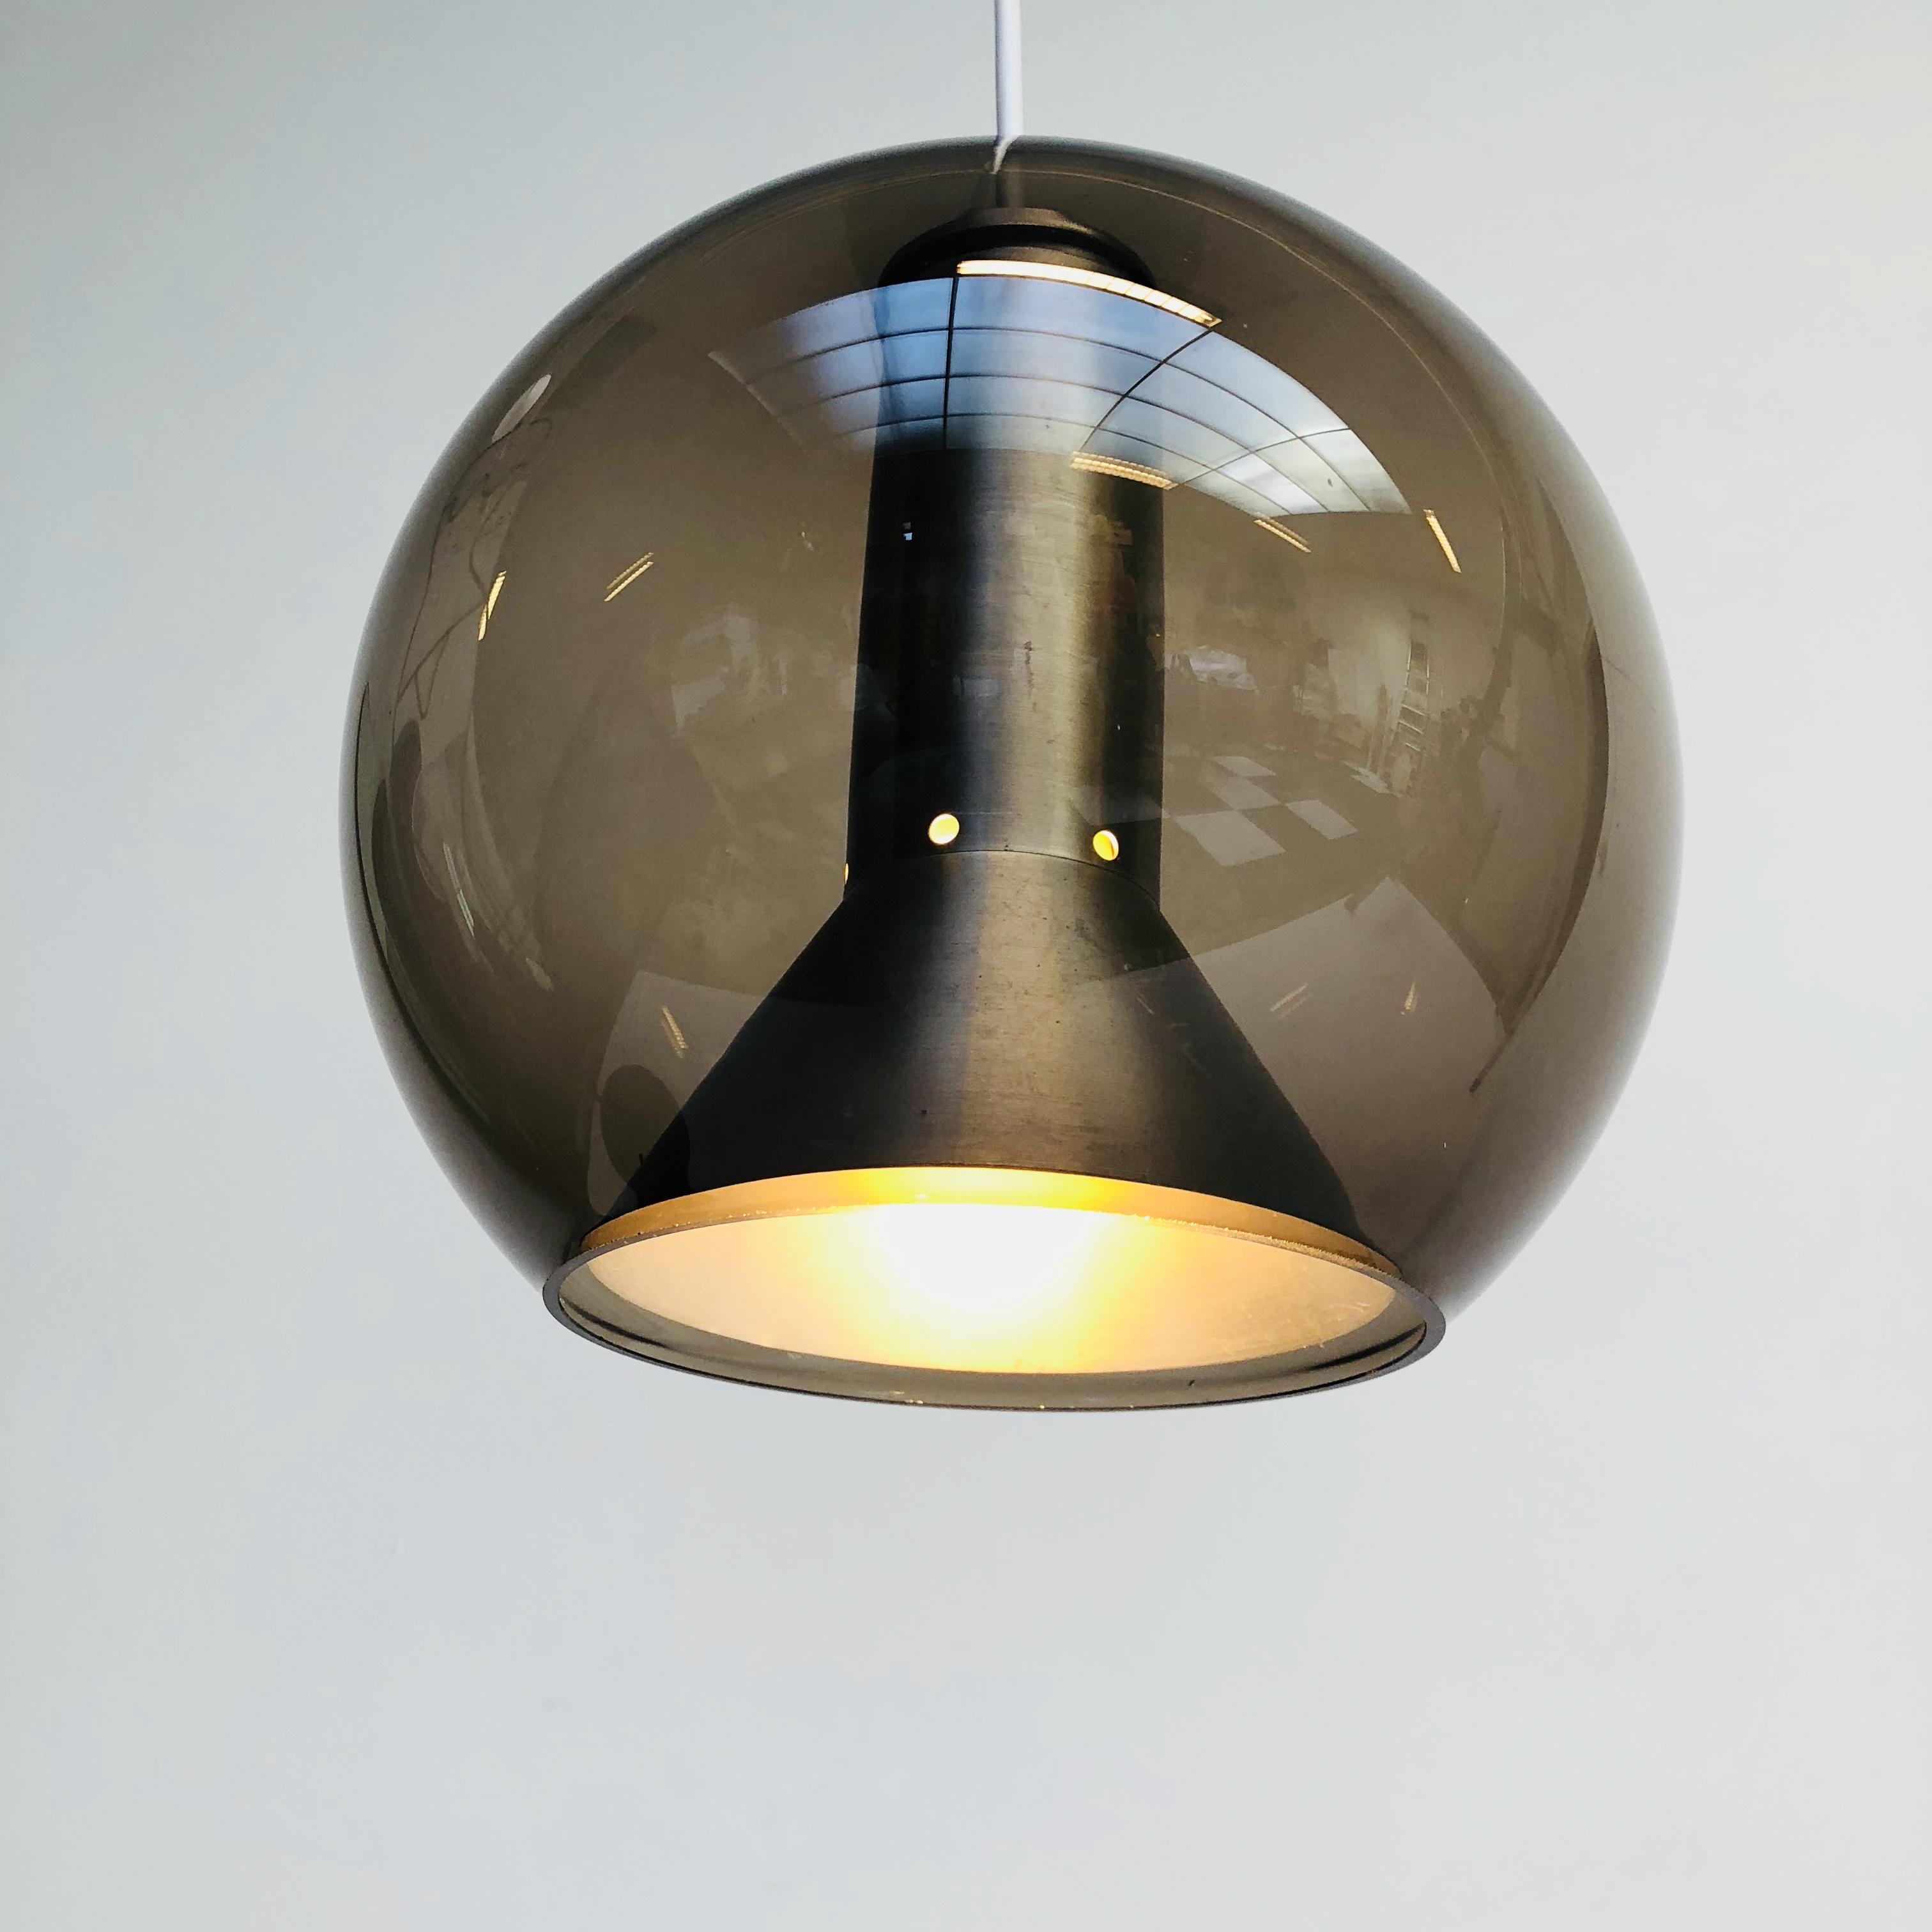 Globe Hanglamp Raak by Frank Ligtelijn '60